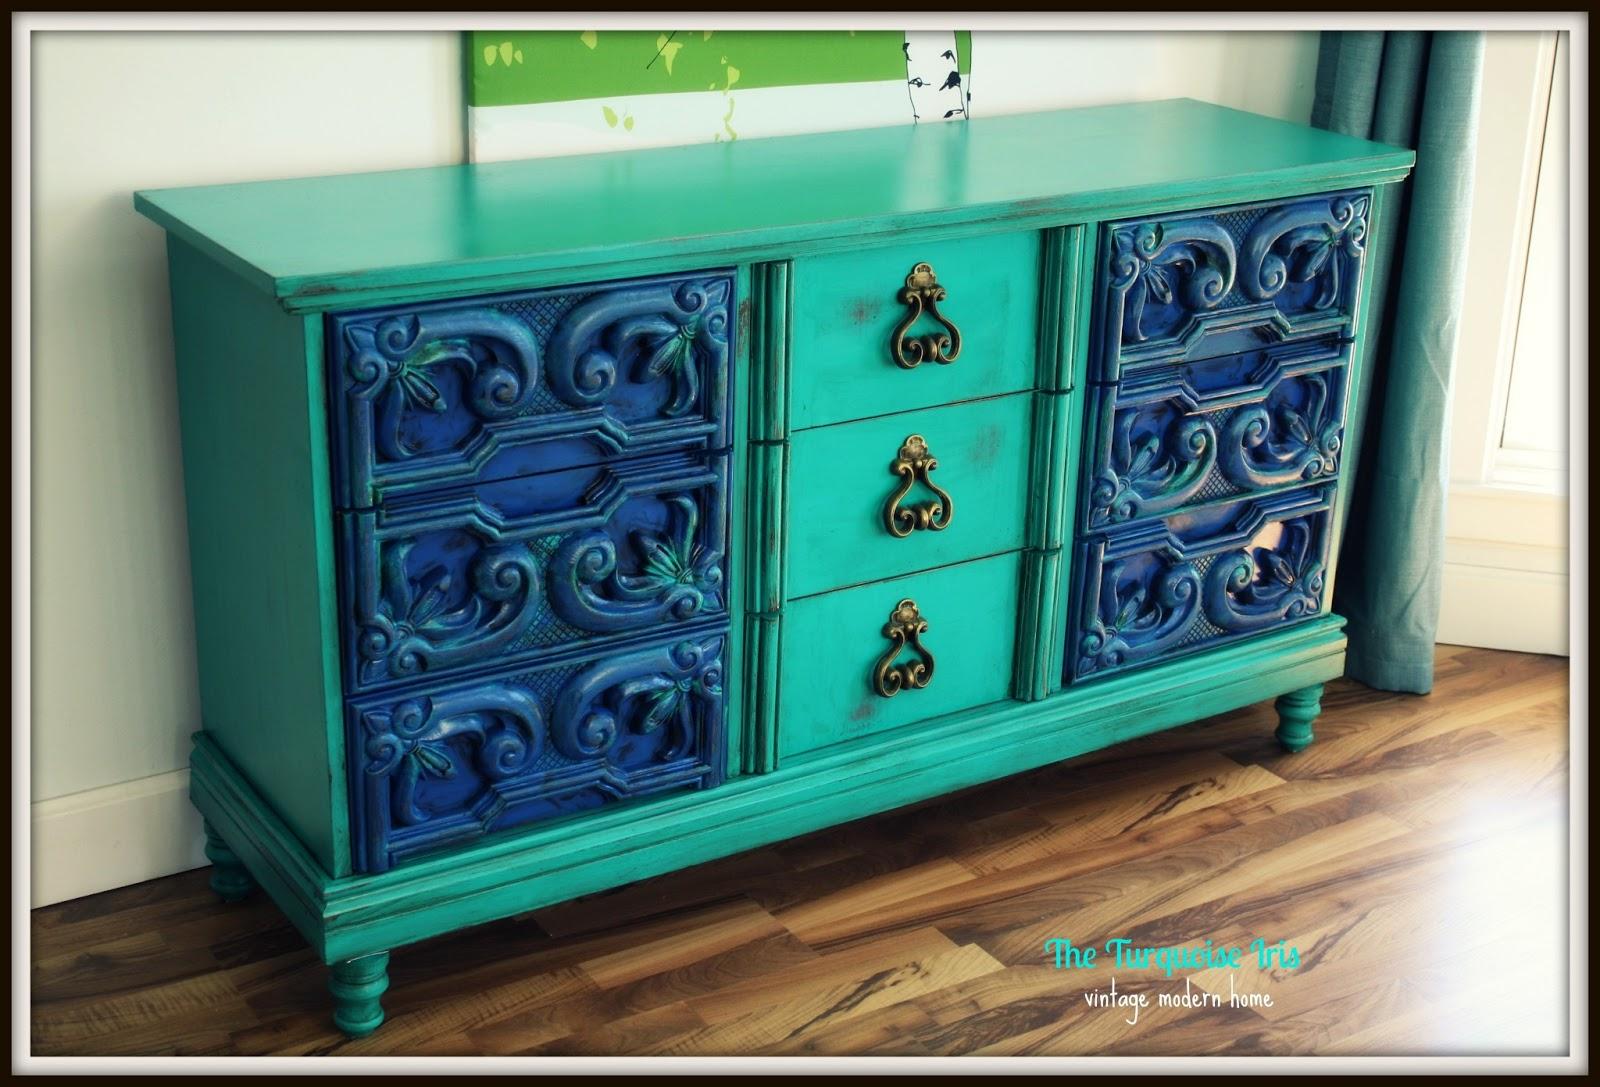 The Turquoise Iris Furniture Amp Art Vintage Dresser In